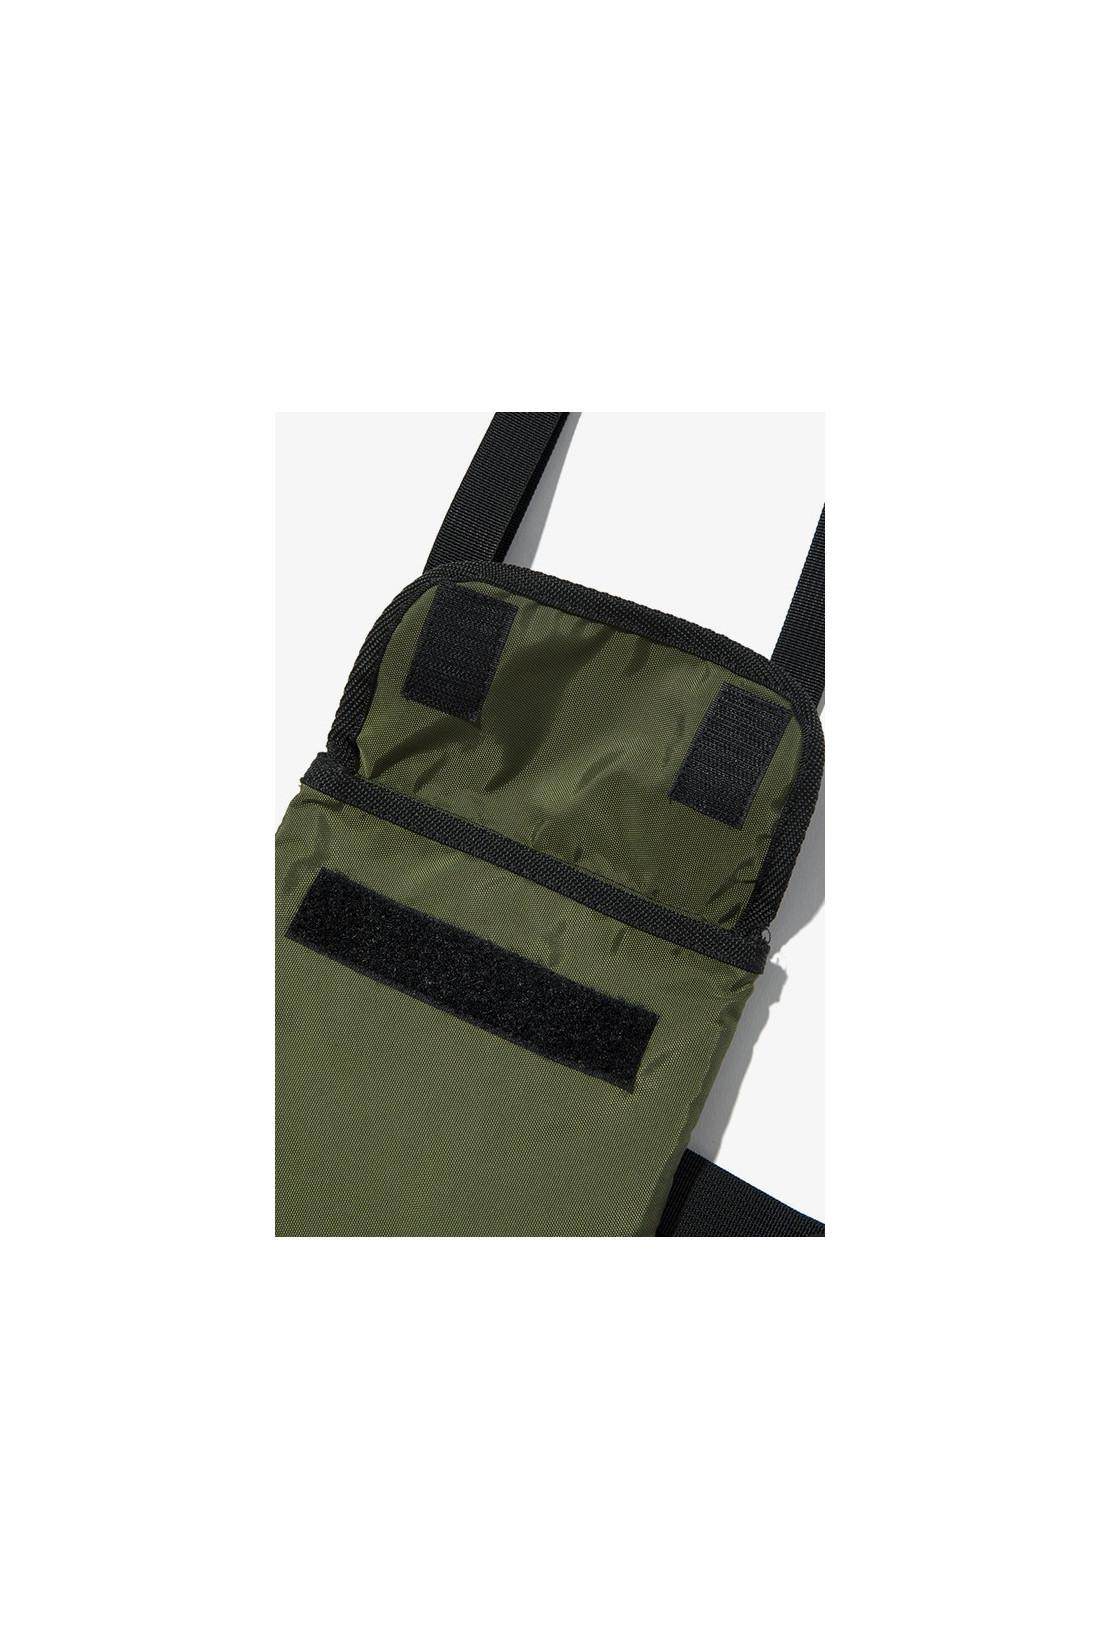 BATTENWEAR / Travel pouch Ranger